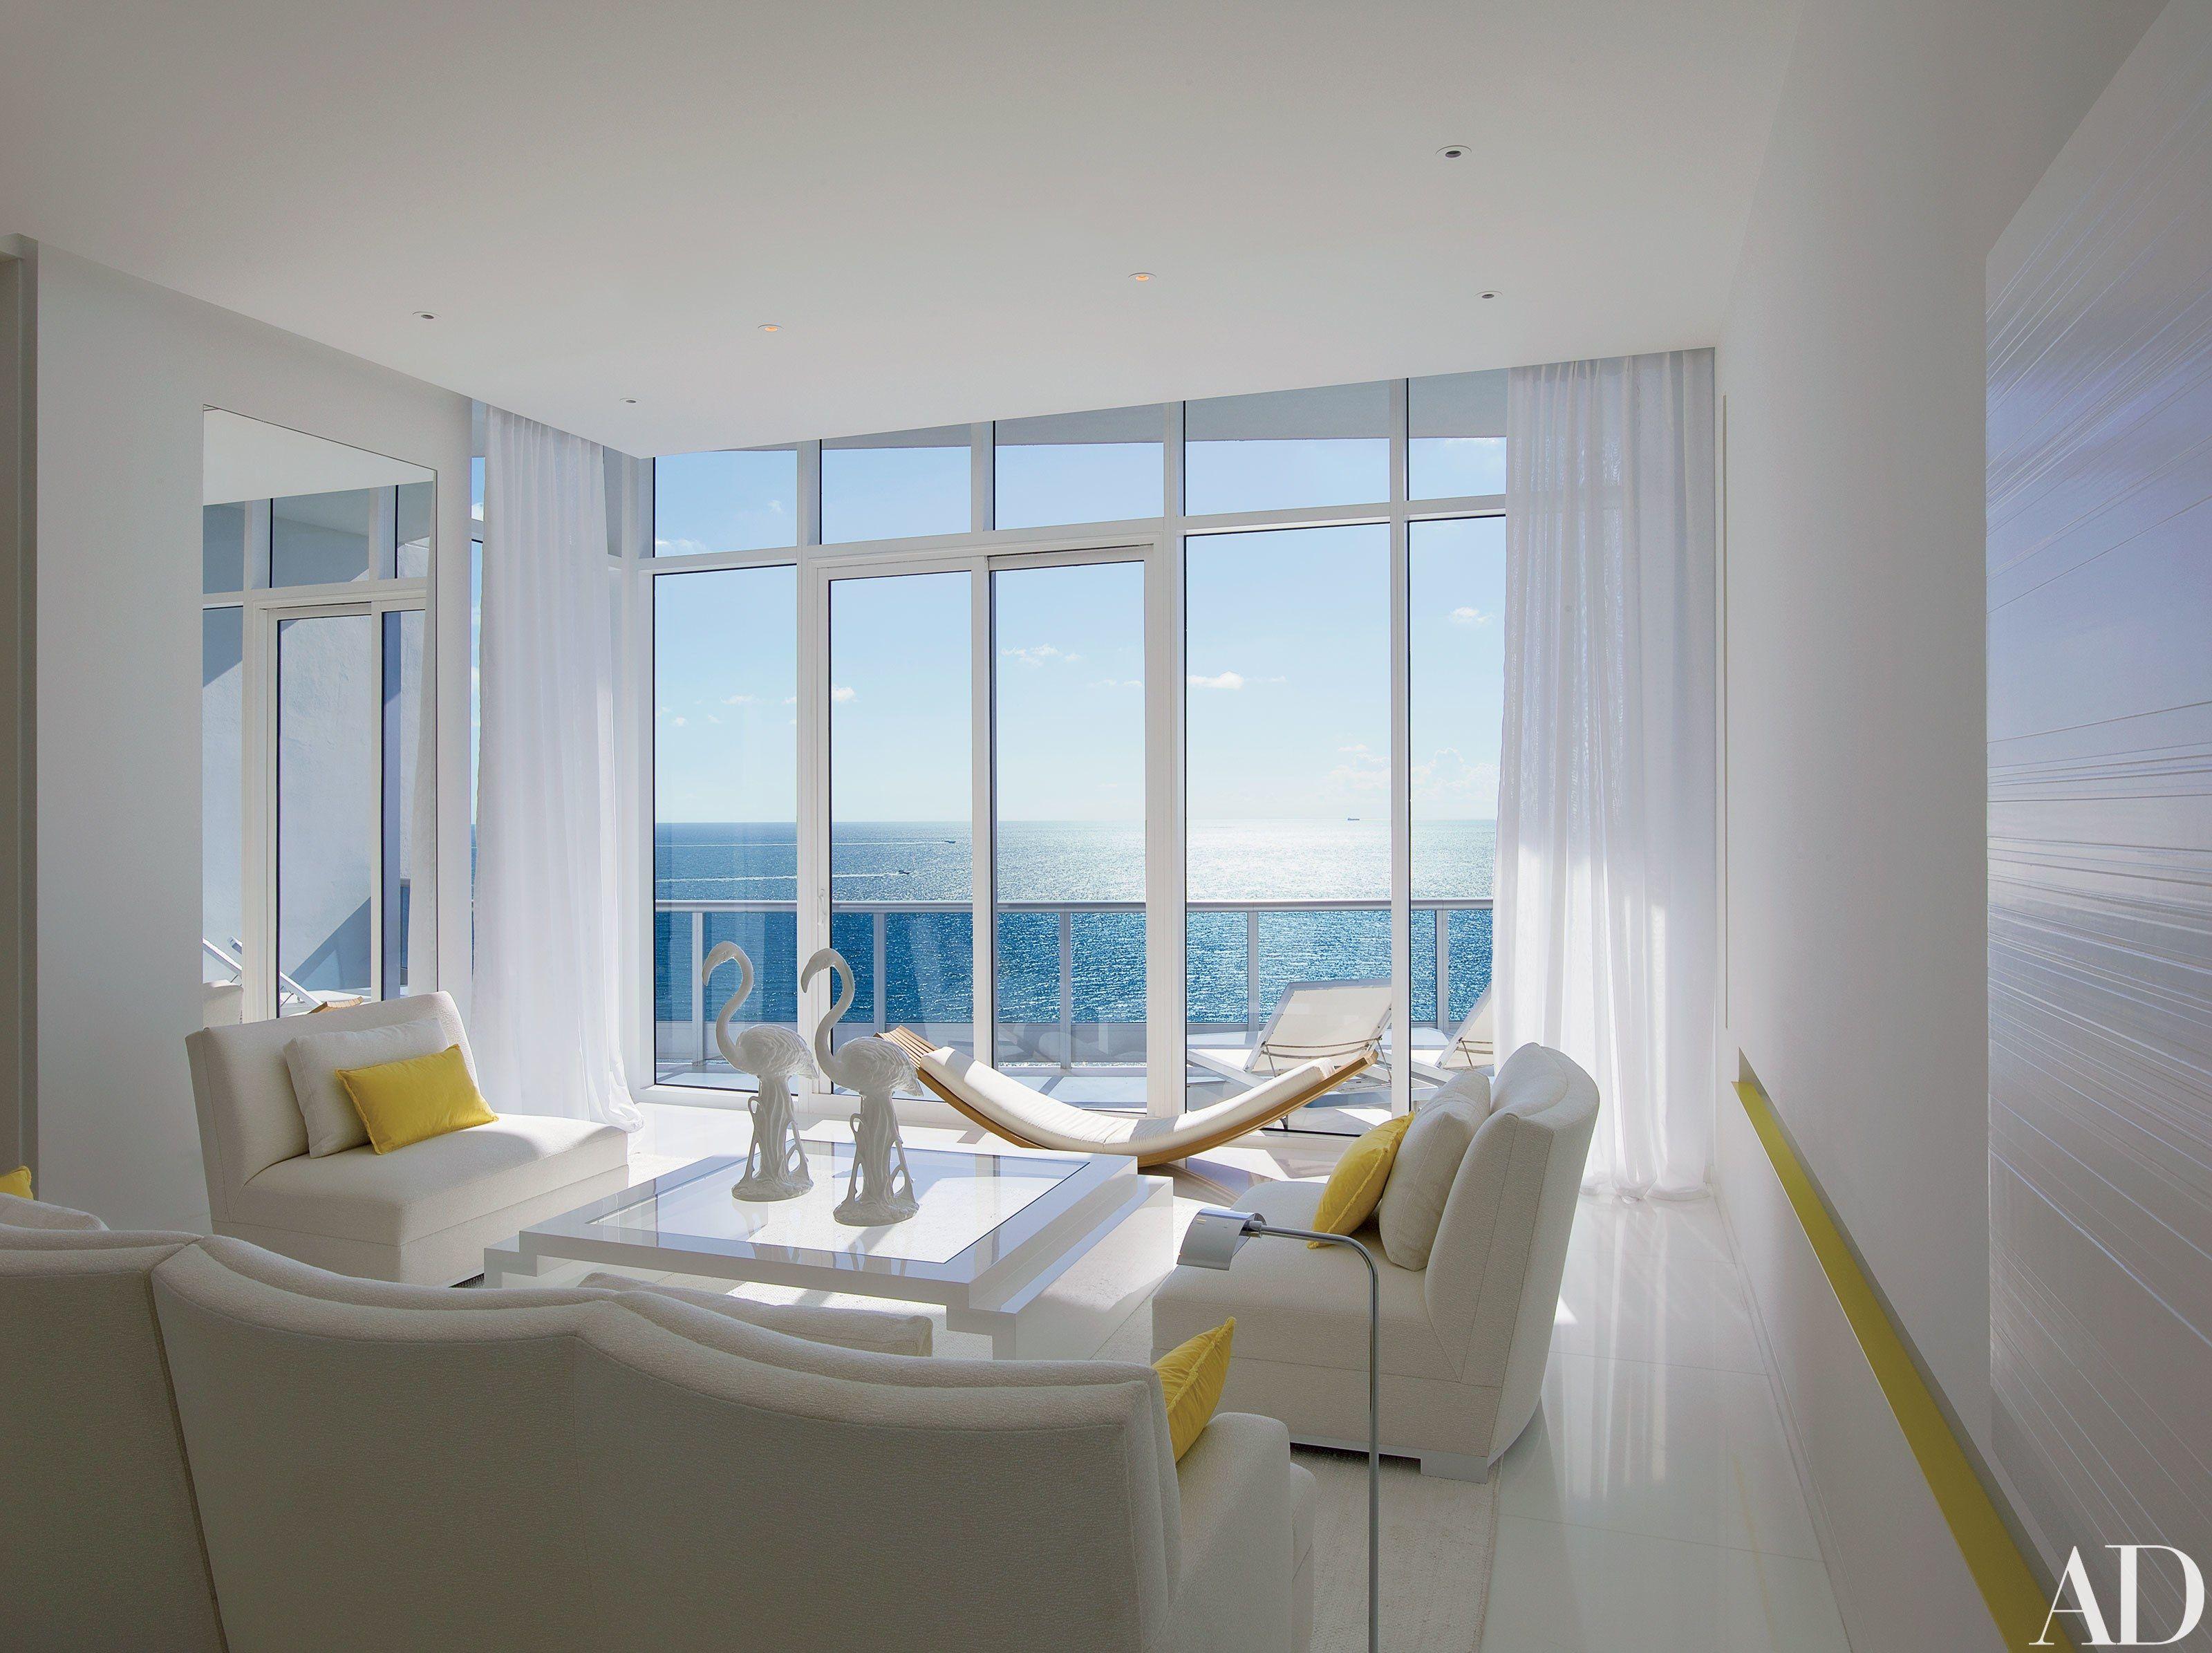 Jennifer post designs a modern marvel in miami beach photos architectural digest